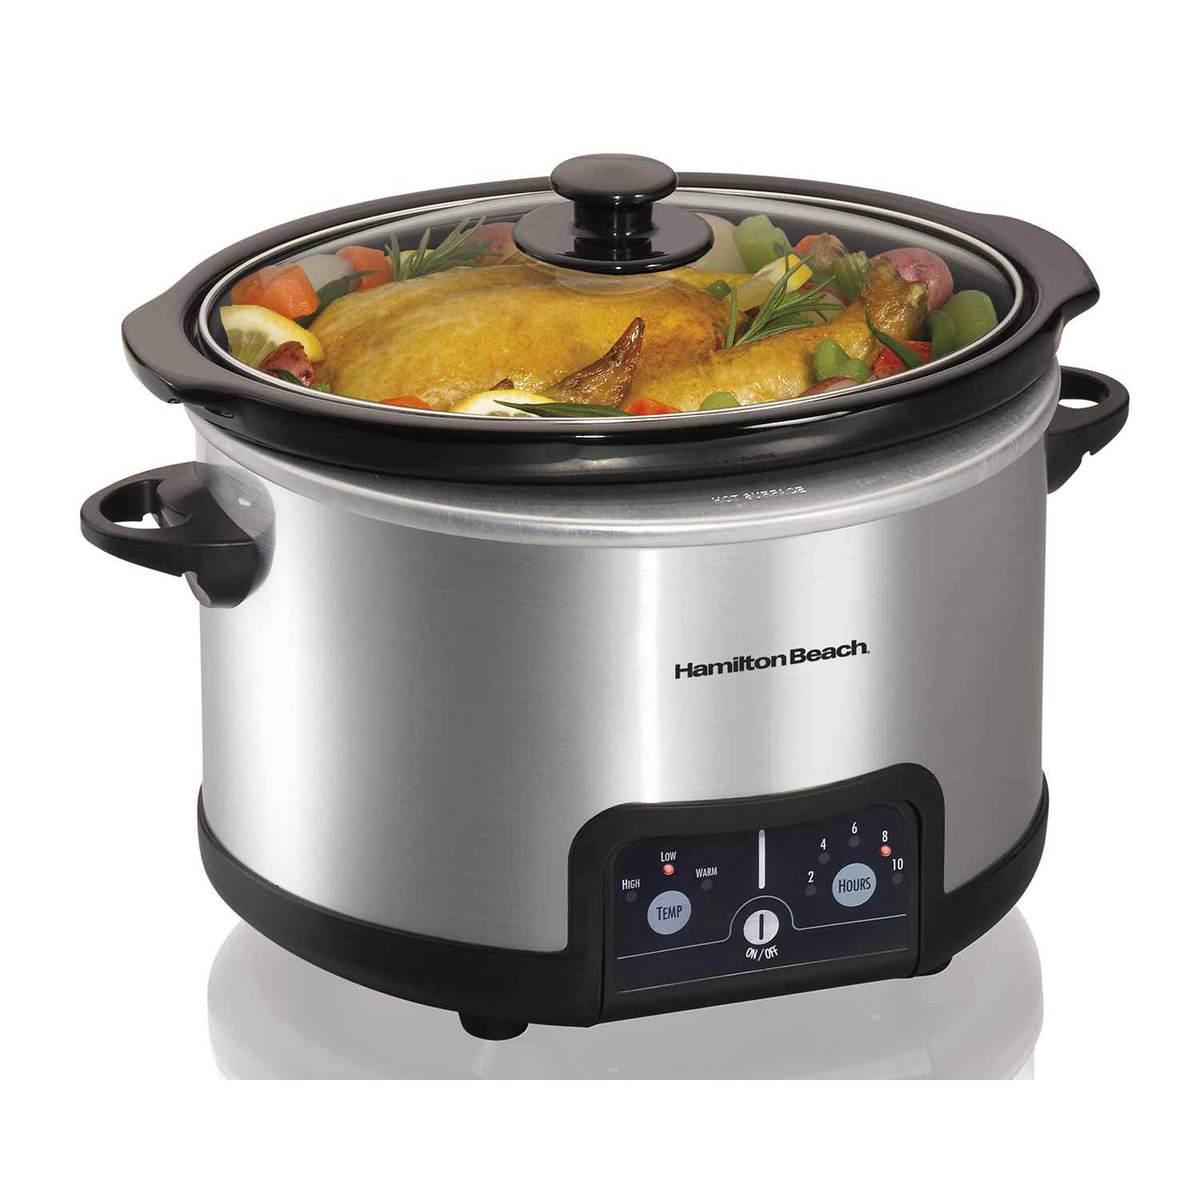 Programmable 4 1/2 Quart Slow Cooker (33247)